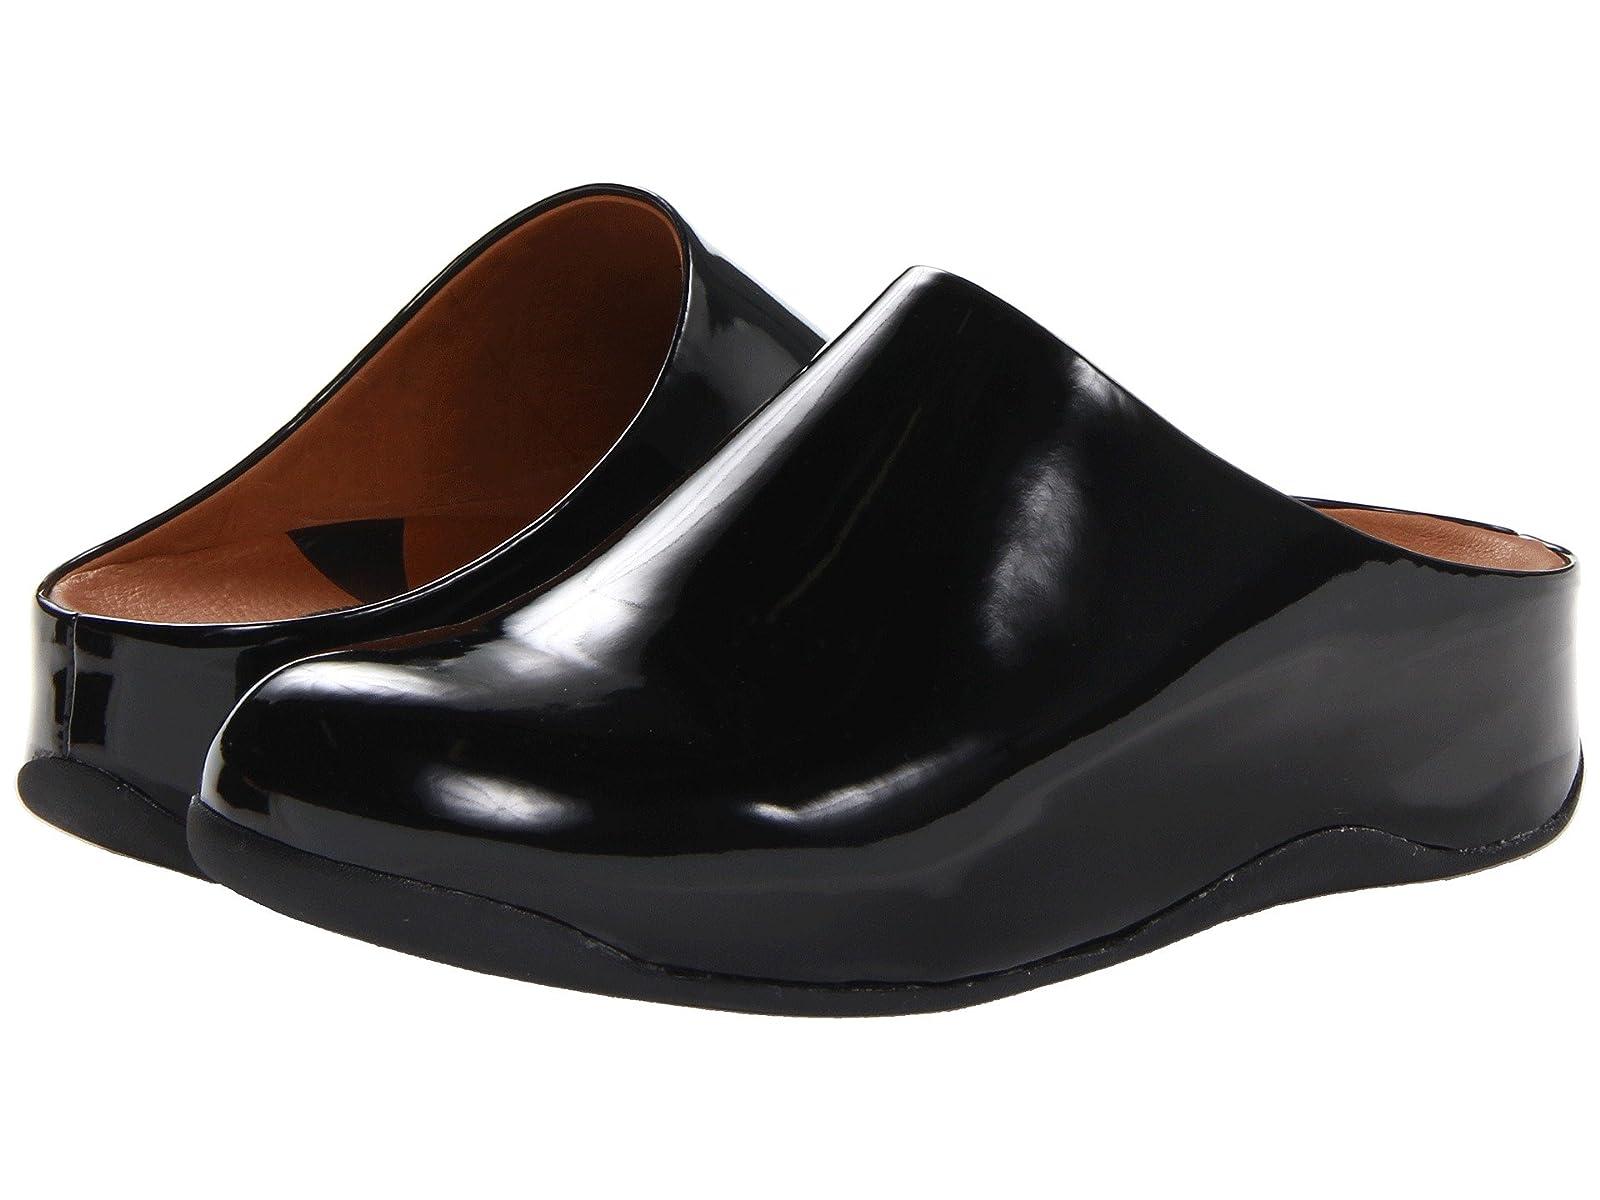 FitFlop Shuv™ PatentAtmospheric grades have affordable shoes